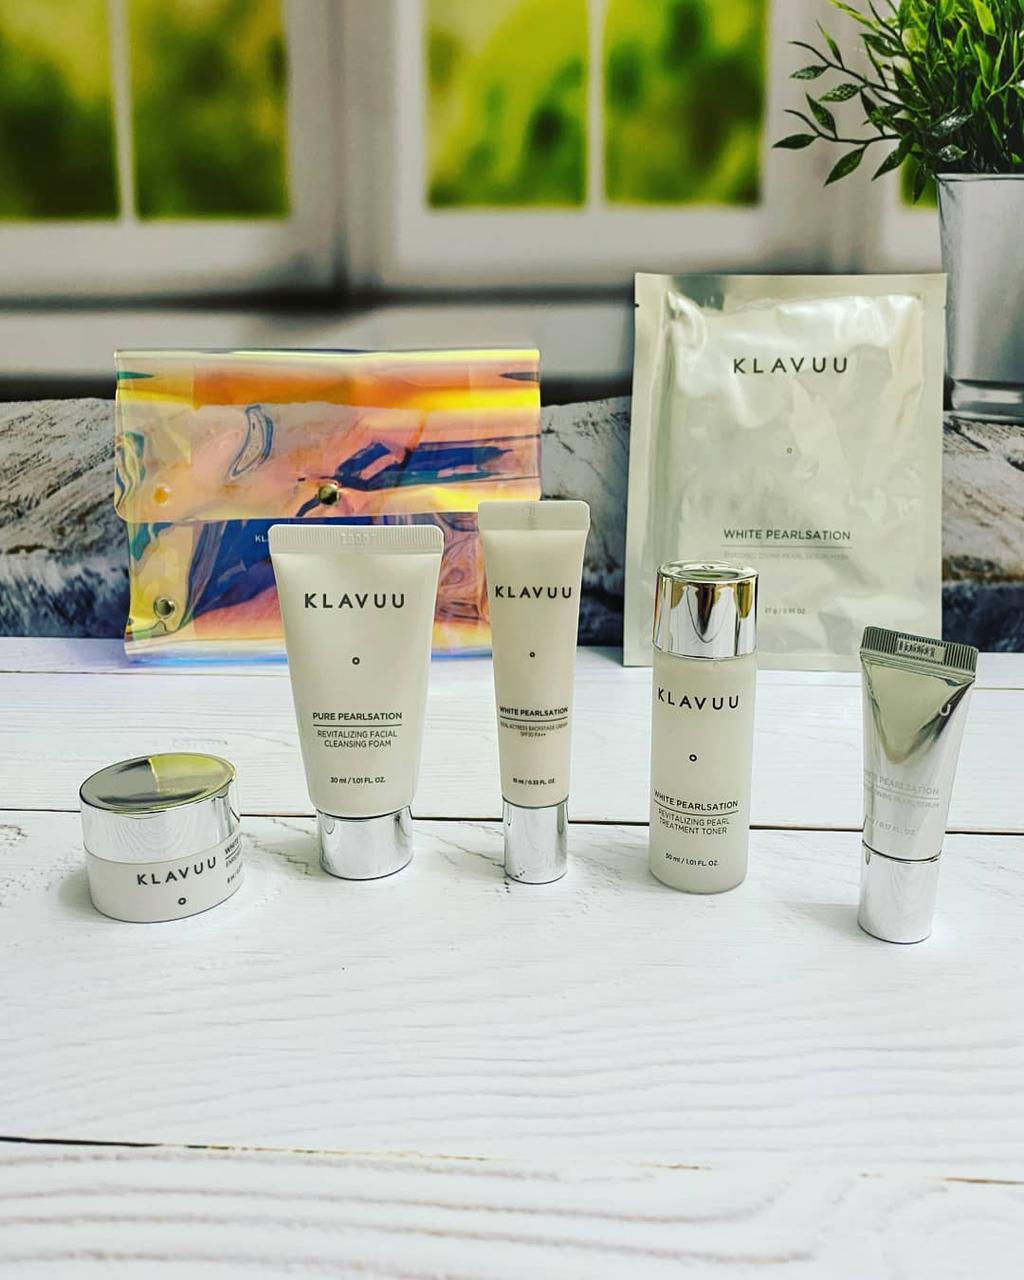 Универсальный мини-набор Klavuu All-In-One Travel Kit